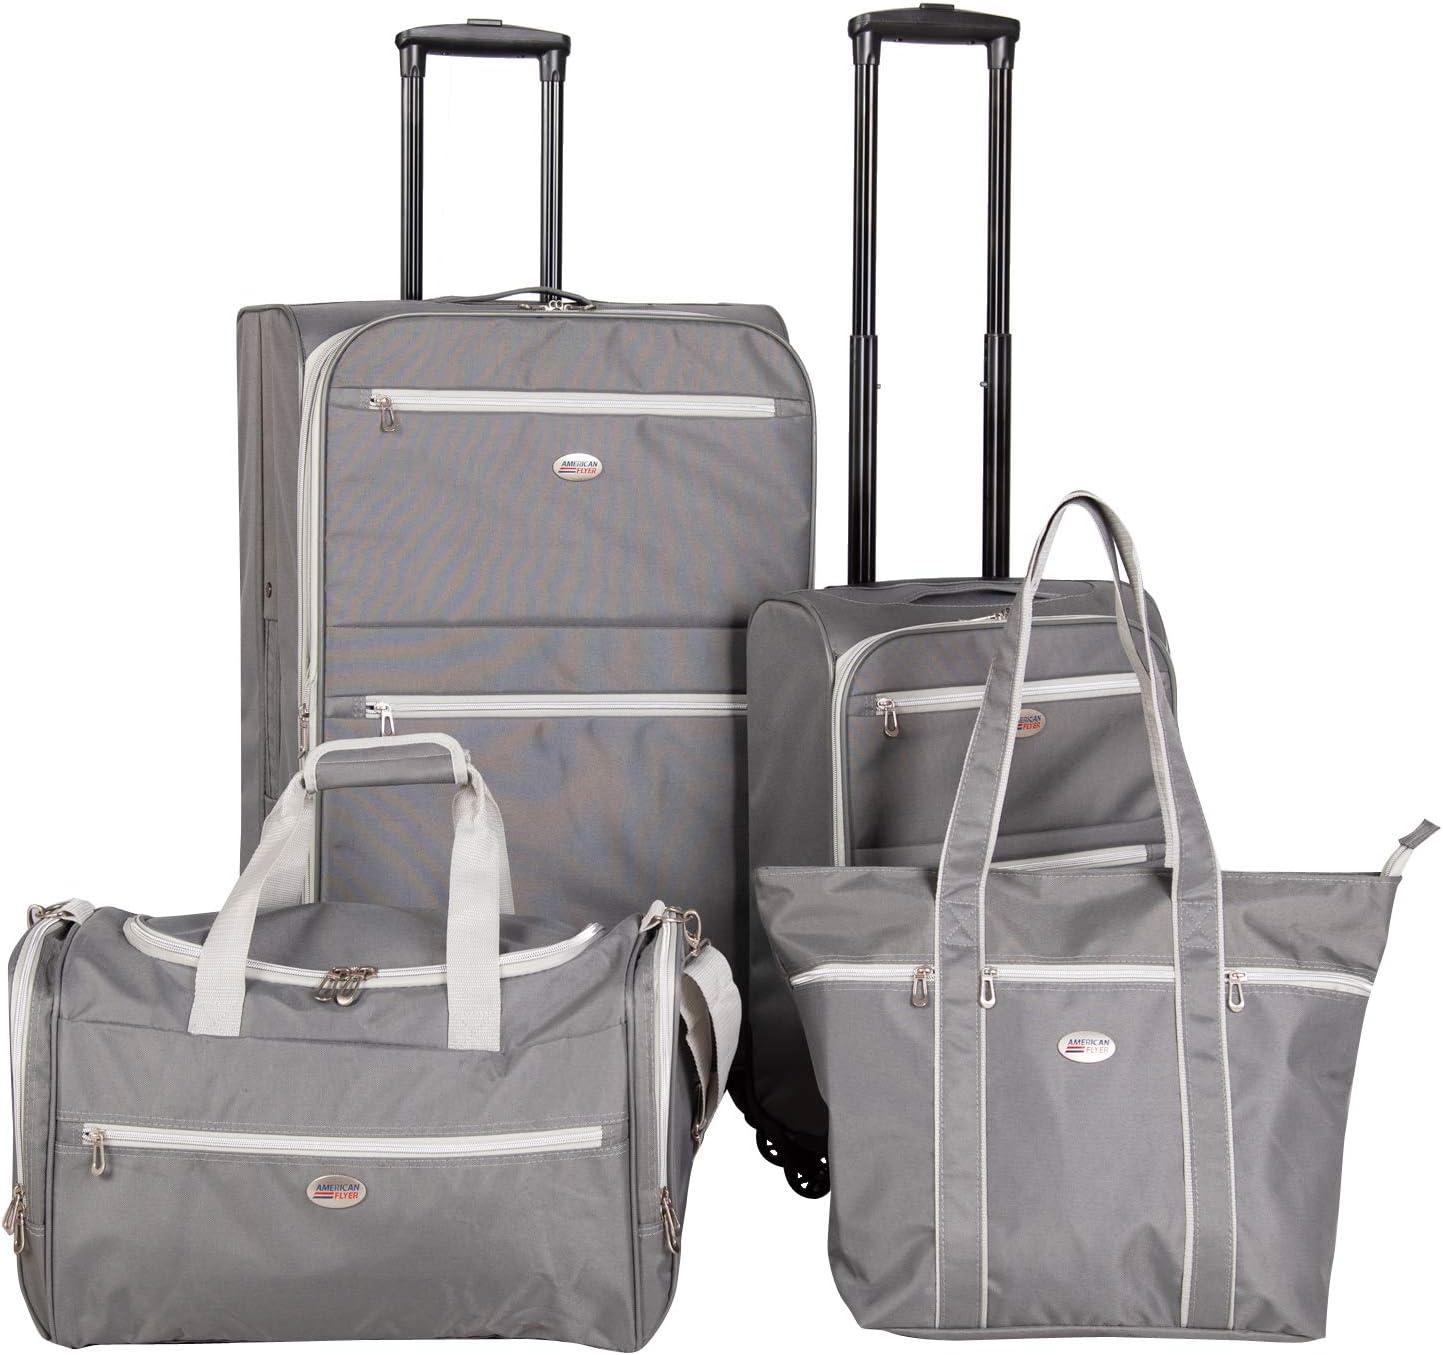 American Flyer Perfect 4-Piece Luggage Set, Grey